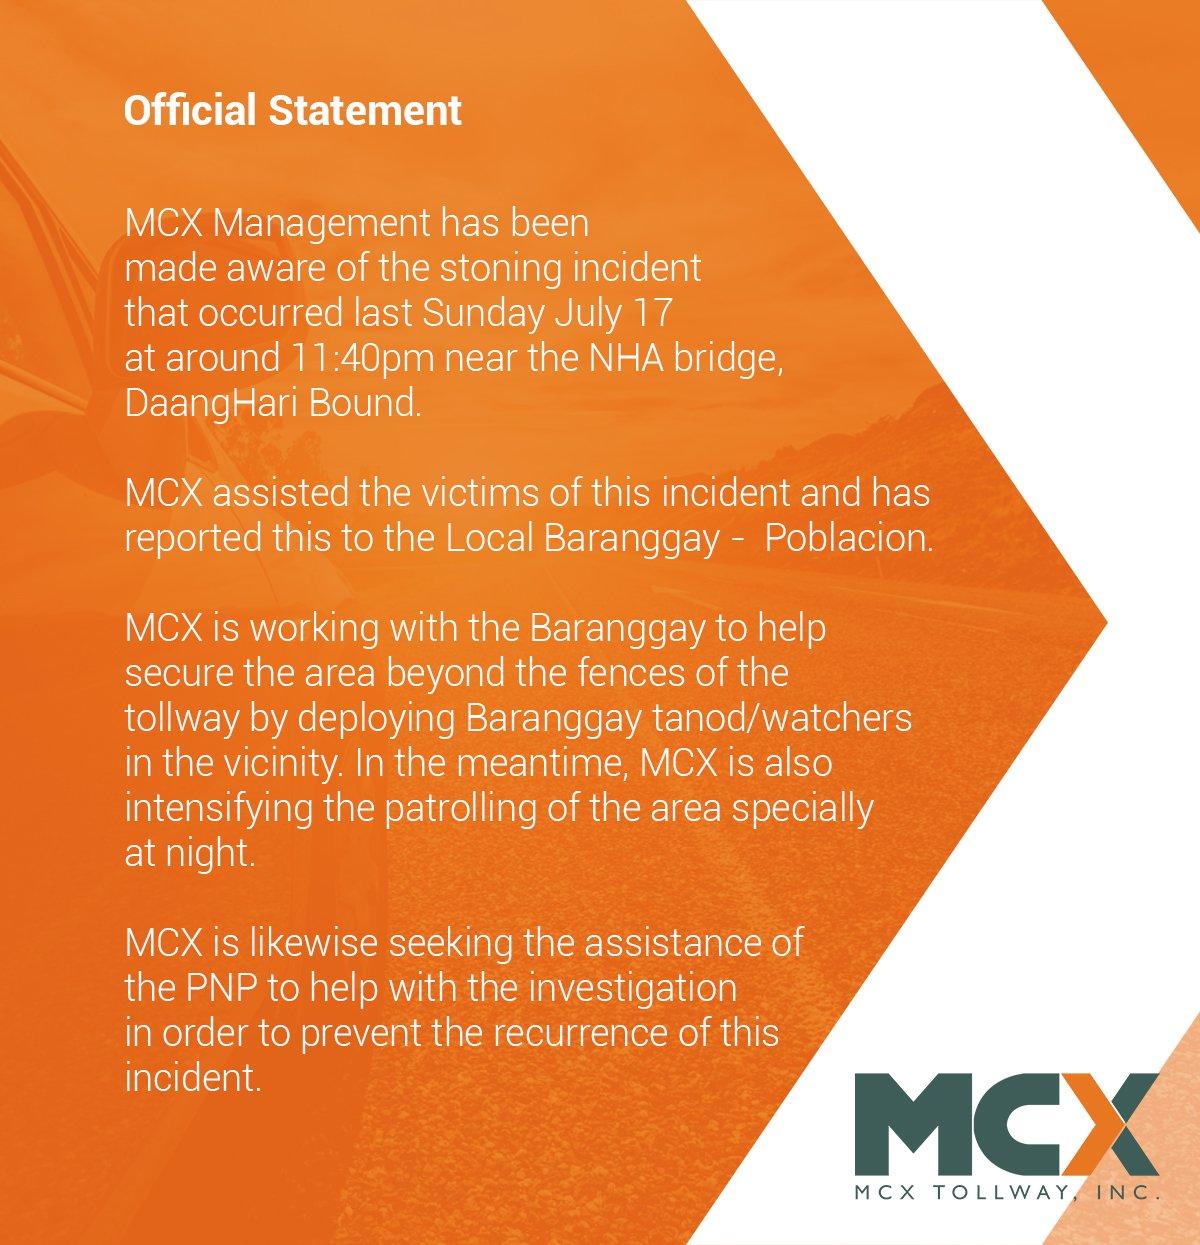 mcx statement